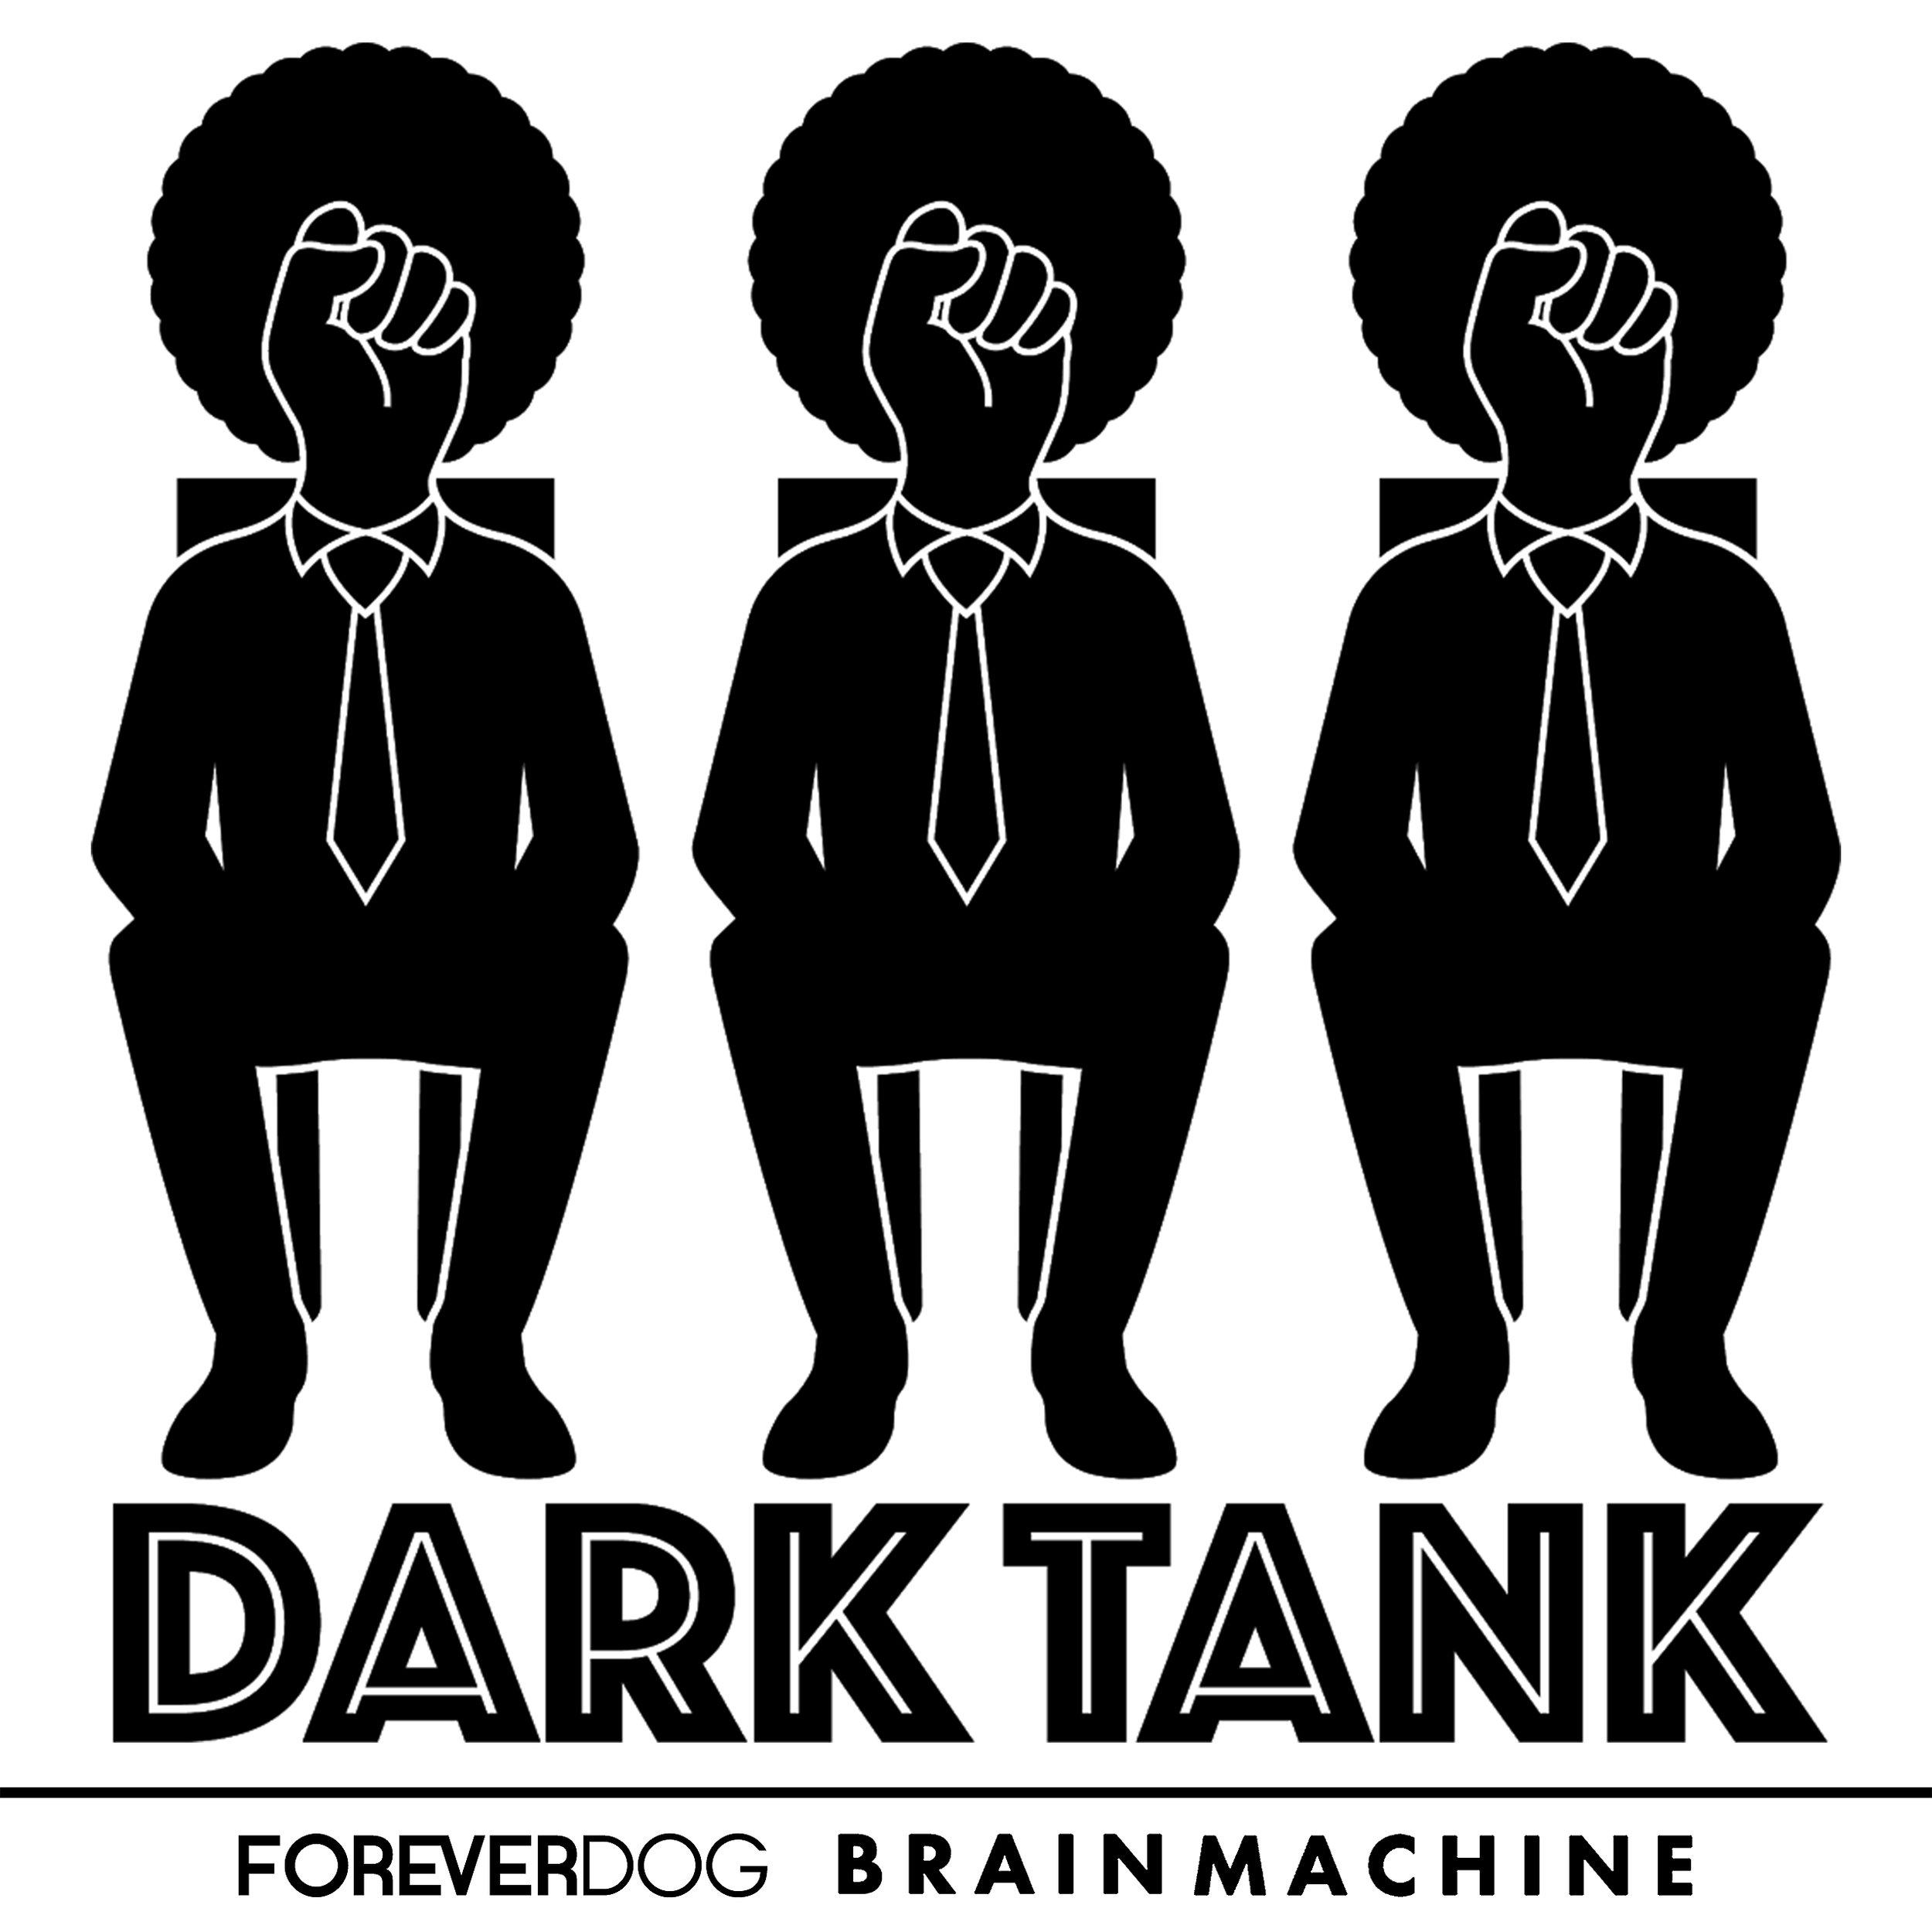 Dark Tank